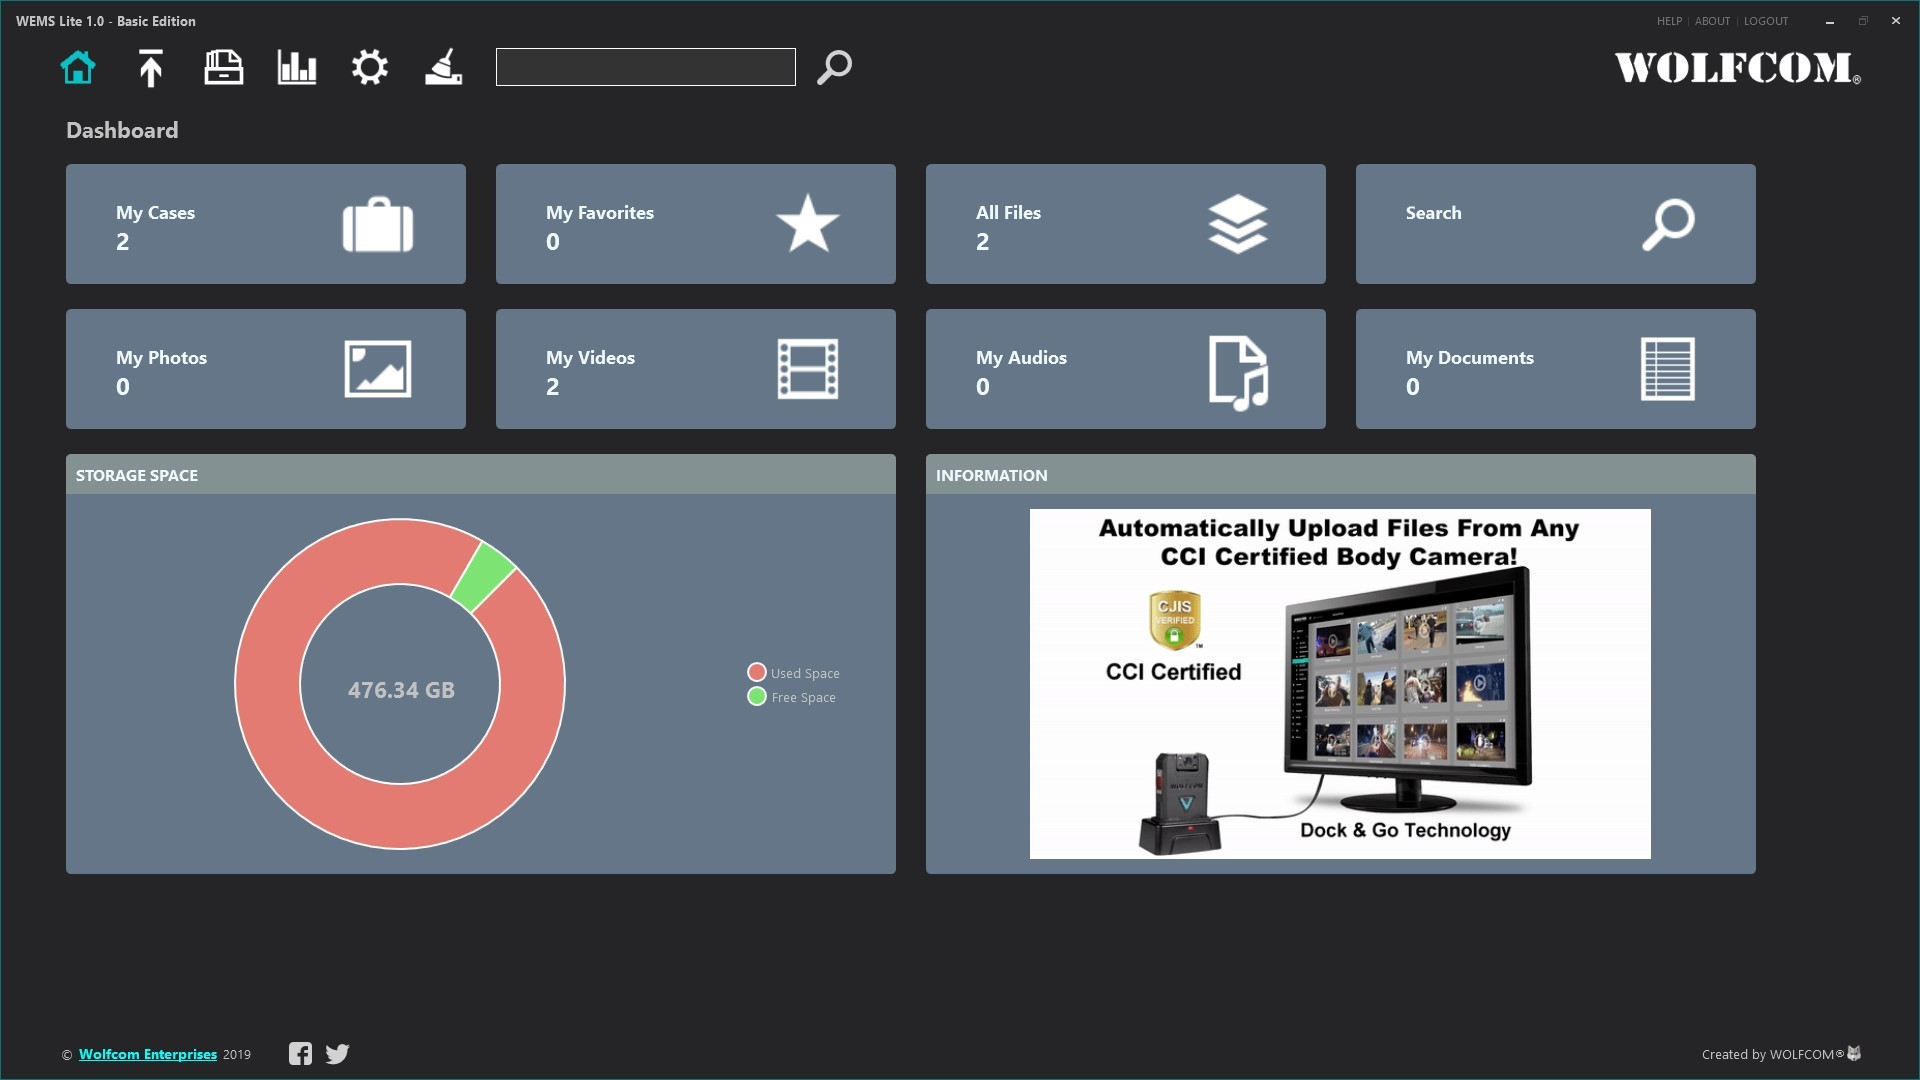 Free download of WEMS Lite WOLFCOM Evidence management Software.